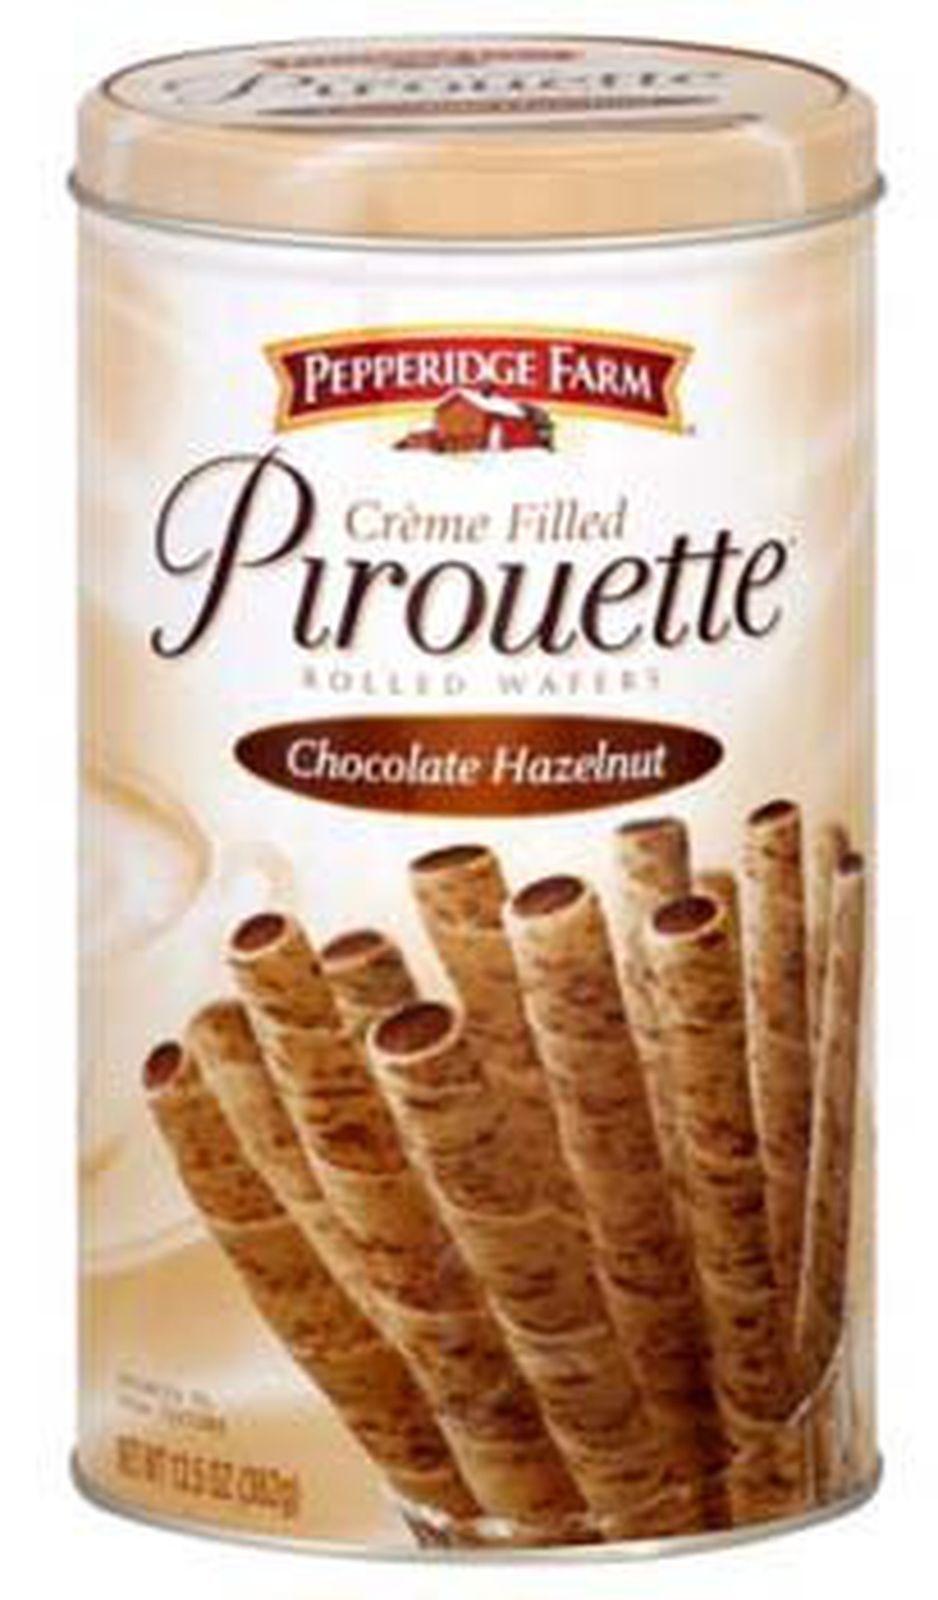 Pepperidge Farm Crème Filled Pirouette Rolled Wafers, Chocolate Hazelnut, 13.... - $50.00